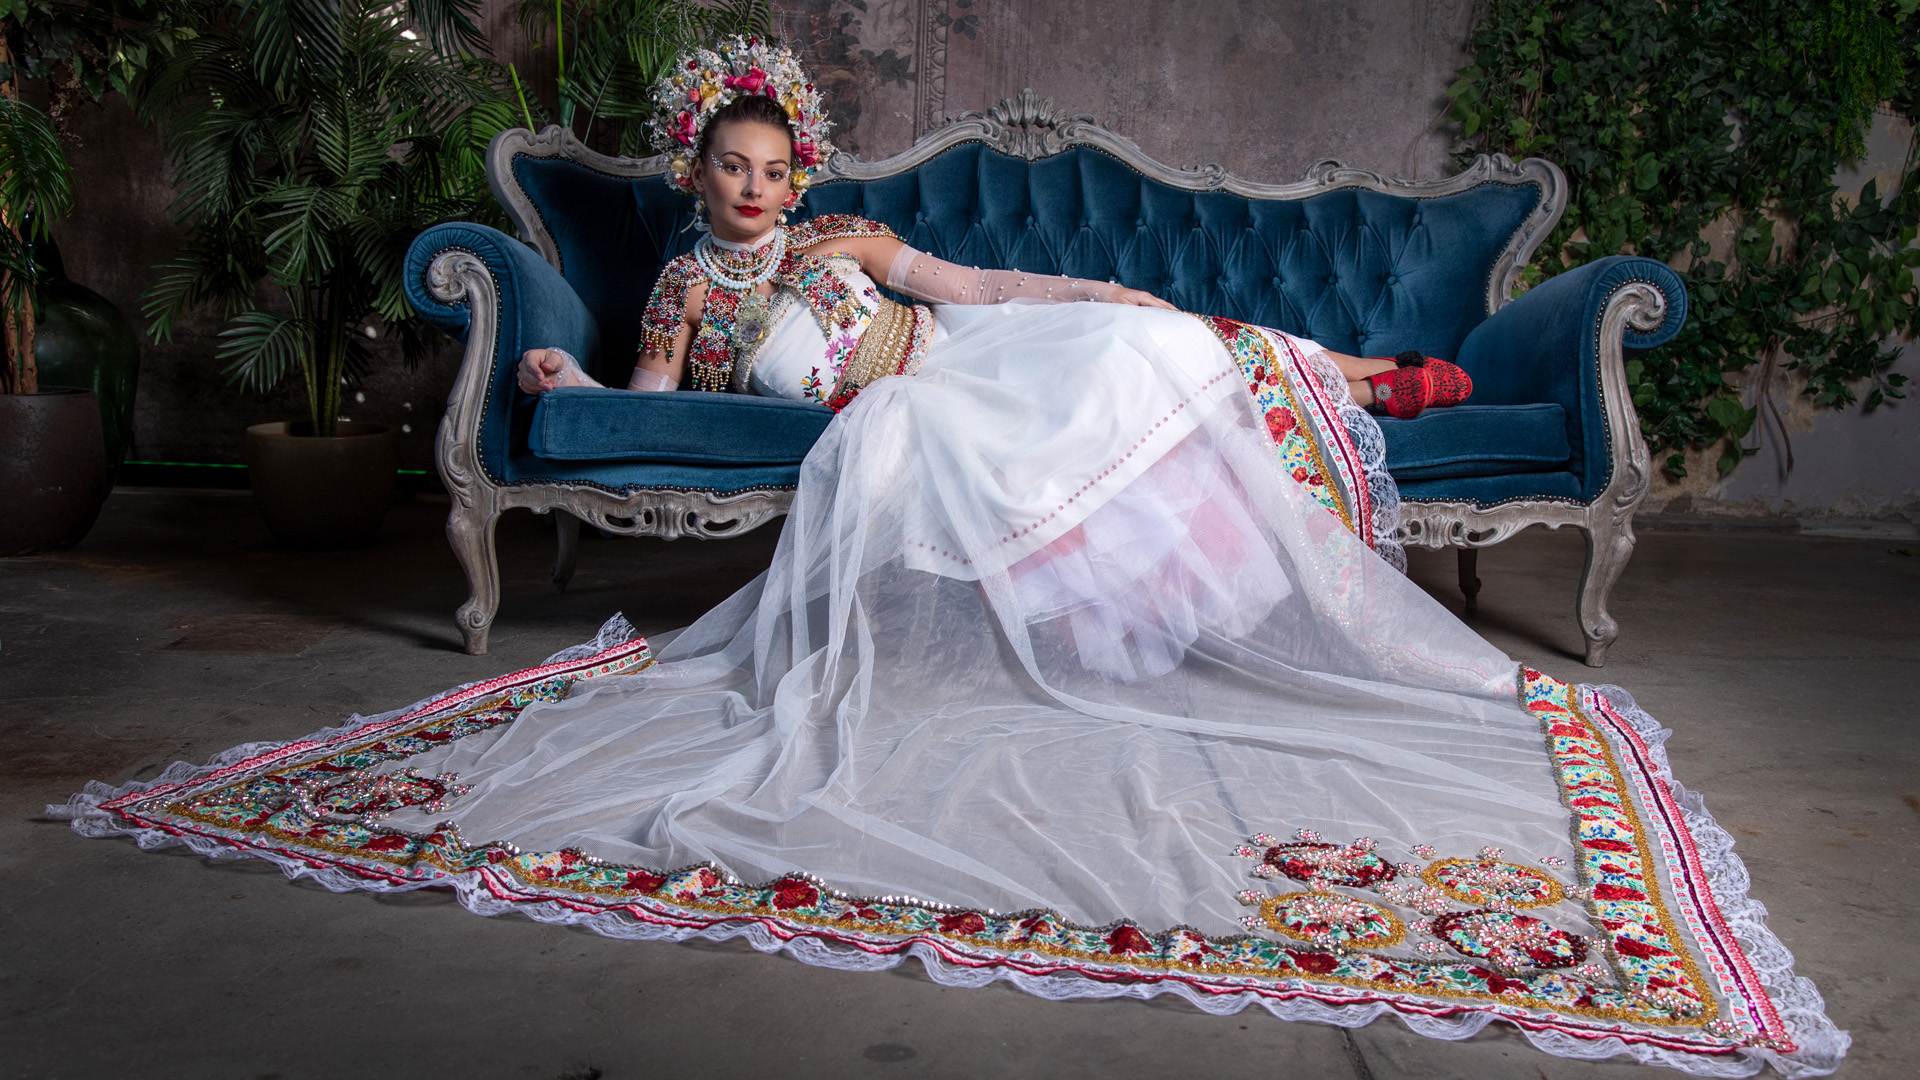 Amerikai címlapon a magyar Frida Cahlo